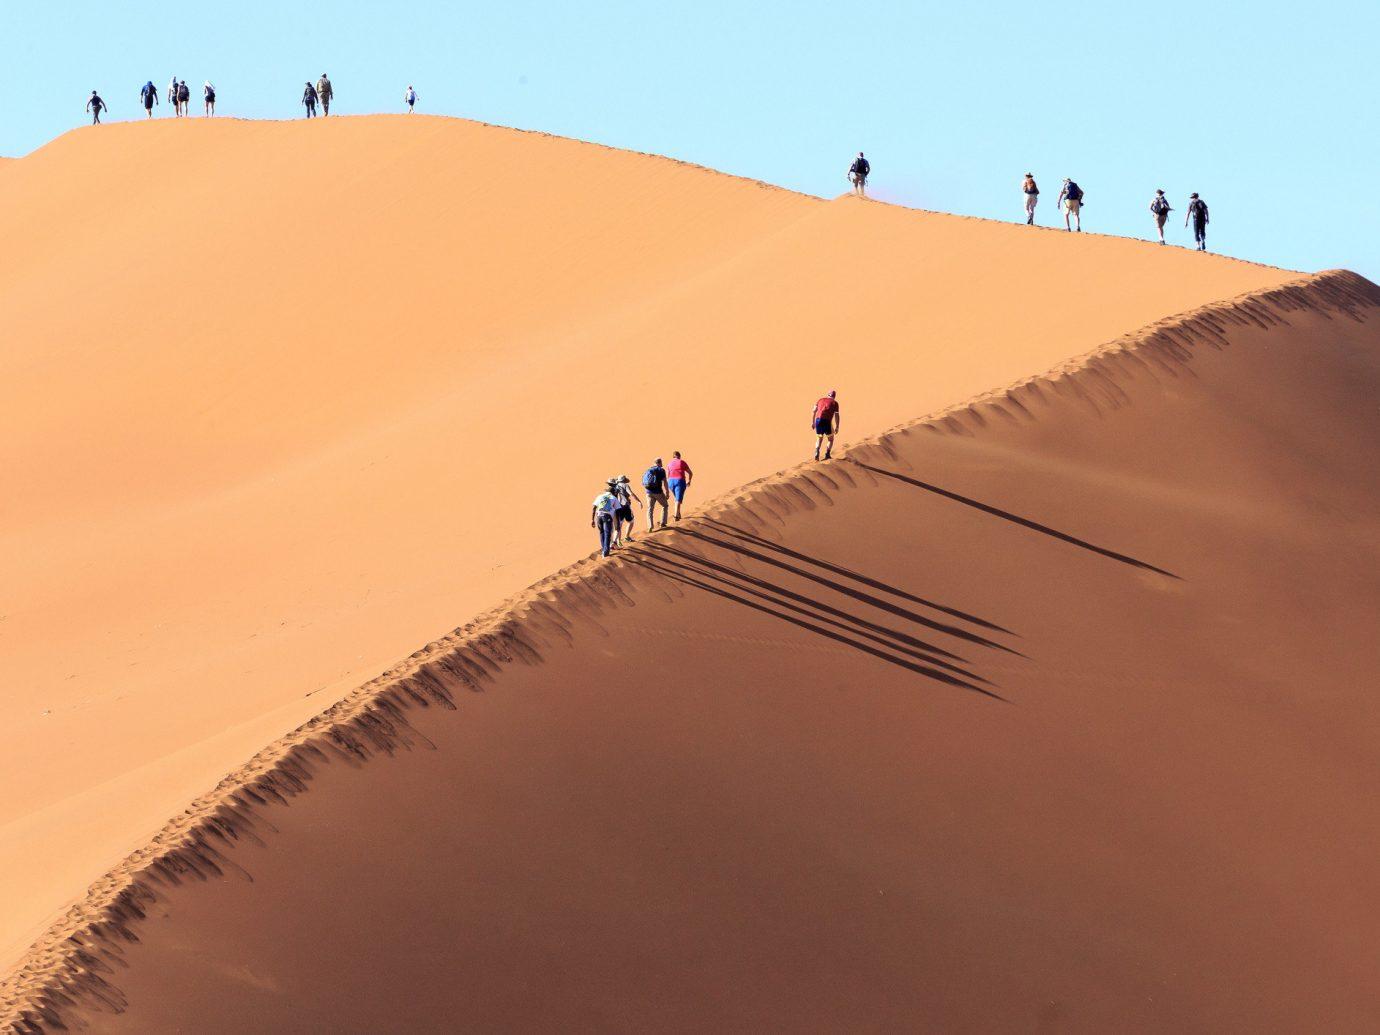 Trip Ideas sky dune Nature habitat erg outdoor natural environment geographical feature landform aeolian landform sand sahara landscape Desert material wadi